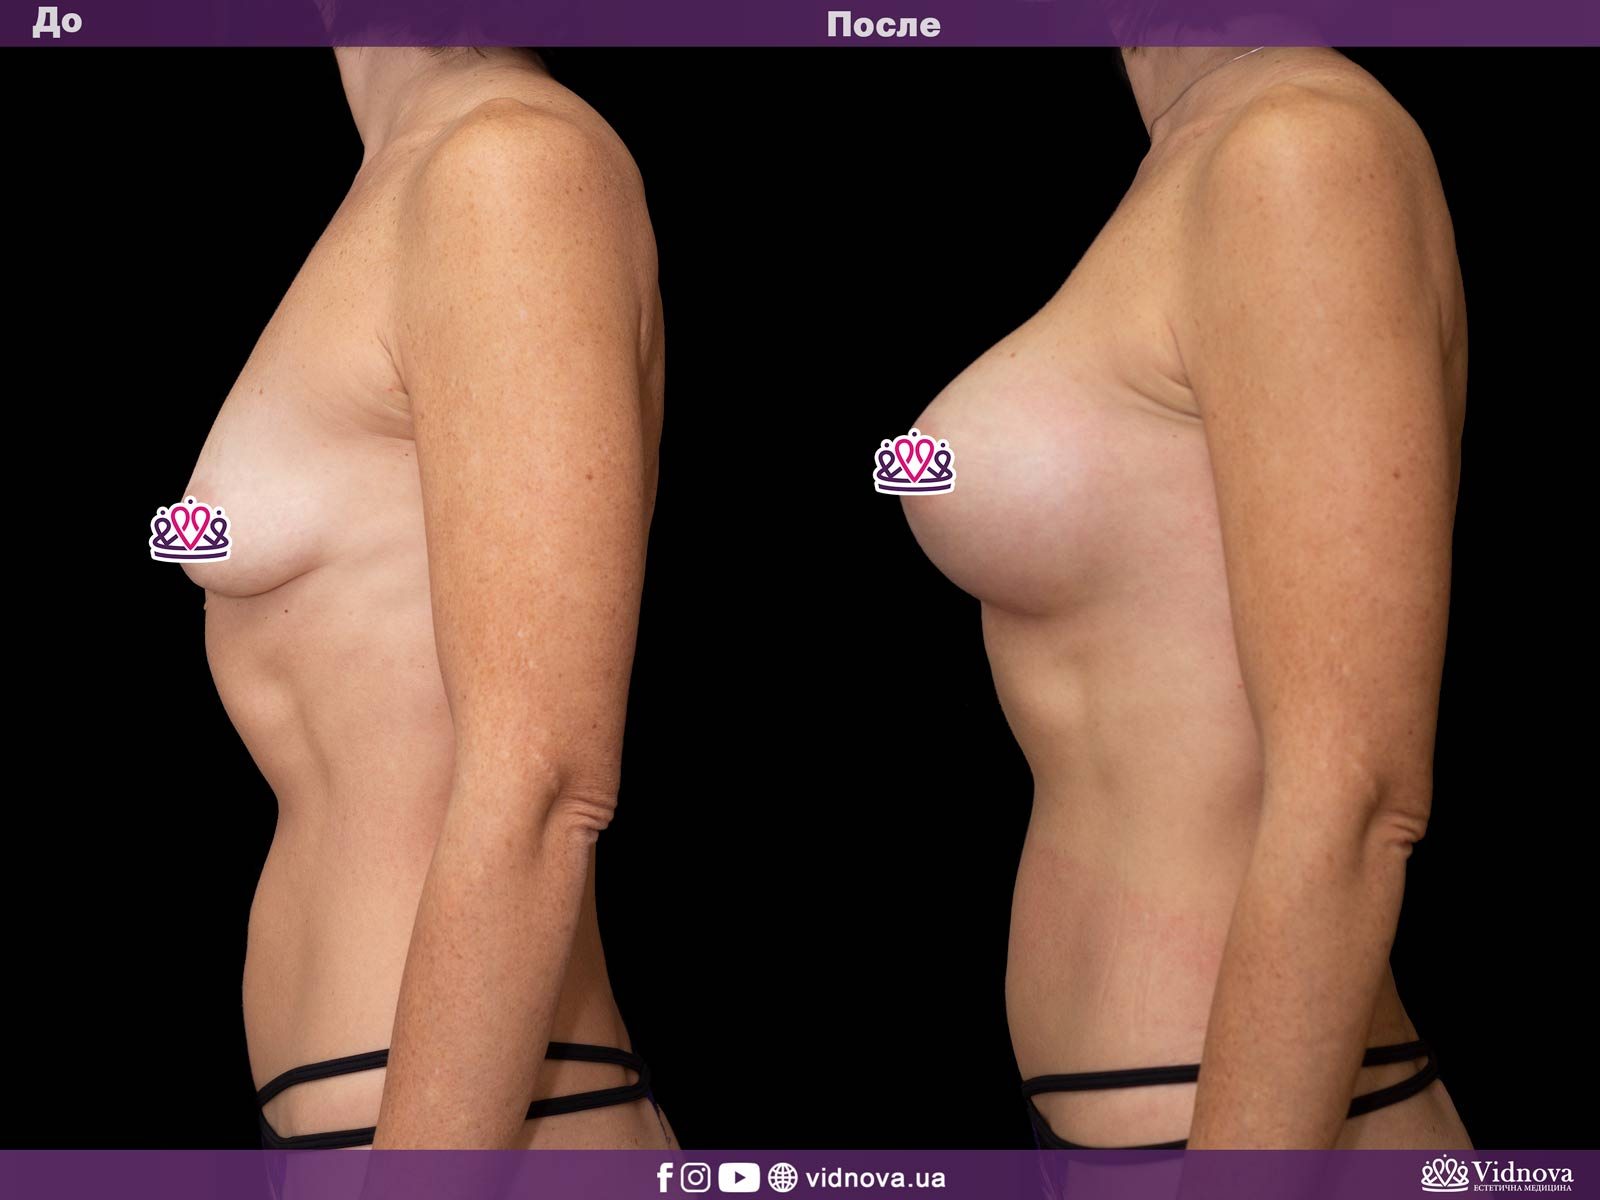 Увеличение груди: Фото ДО и ПОСЛЕ - Пример №32-3 - Клиника Vidnova